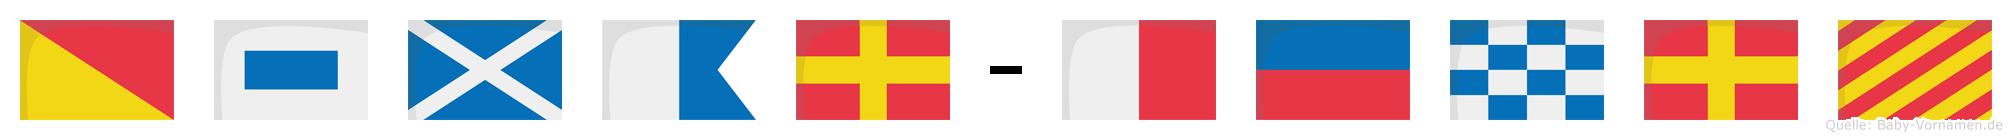 Osmar-Henry im Flaggenalphabet